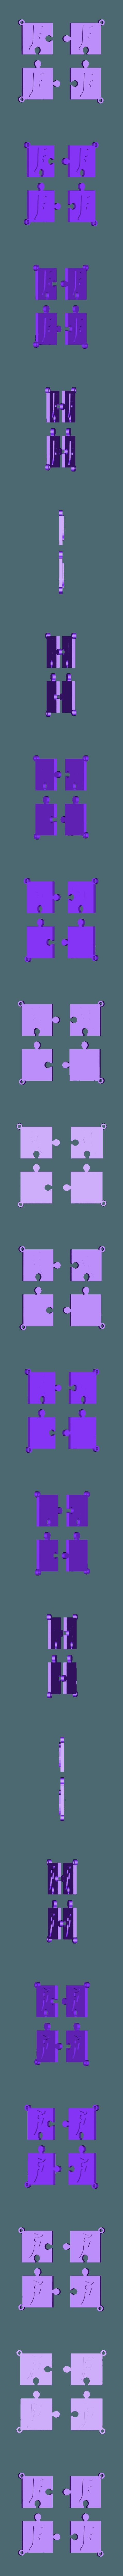 puzzle f.stl Download STL file puzzle key ring • 3D printing design, catf3d